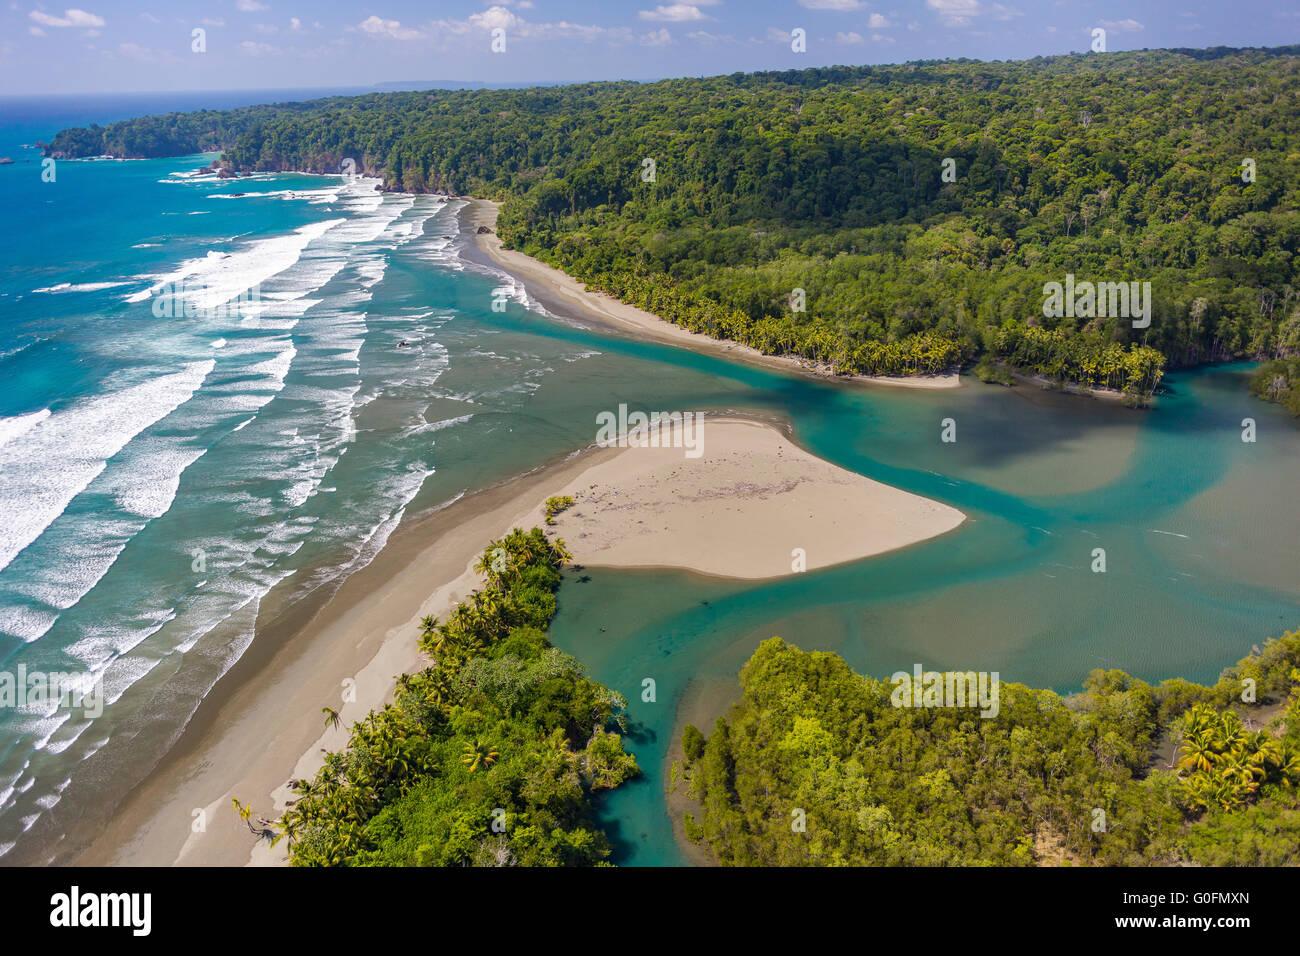 CORCOVADO NATIONAL PARK, COSTA RICA - Rio Claro empties into Pacific Ocean, Osa Peninsula rain forest. - Stock Image